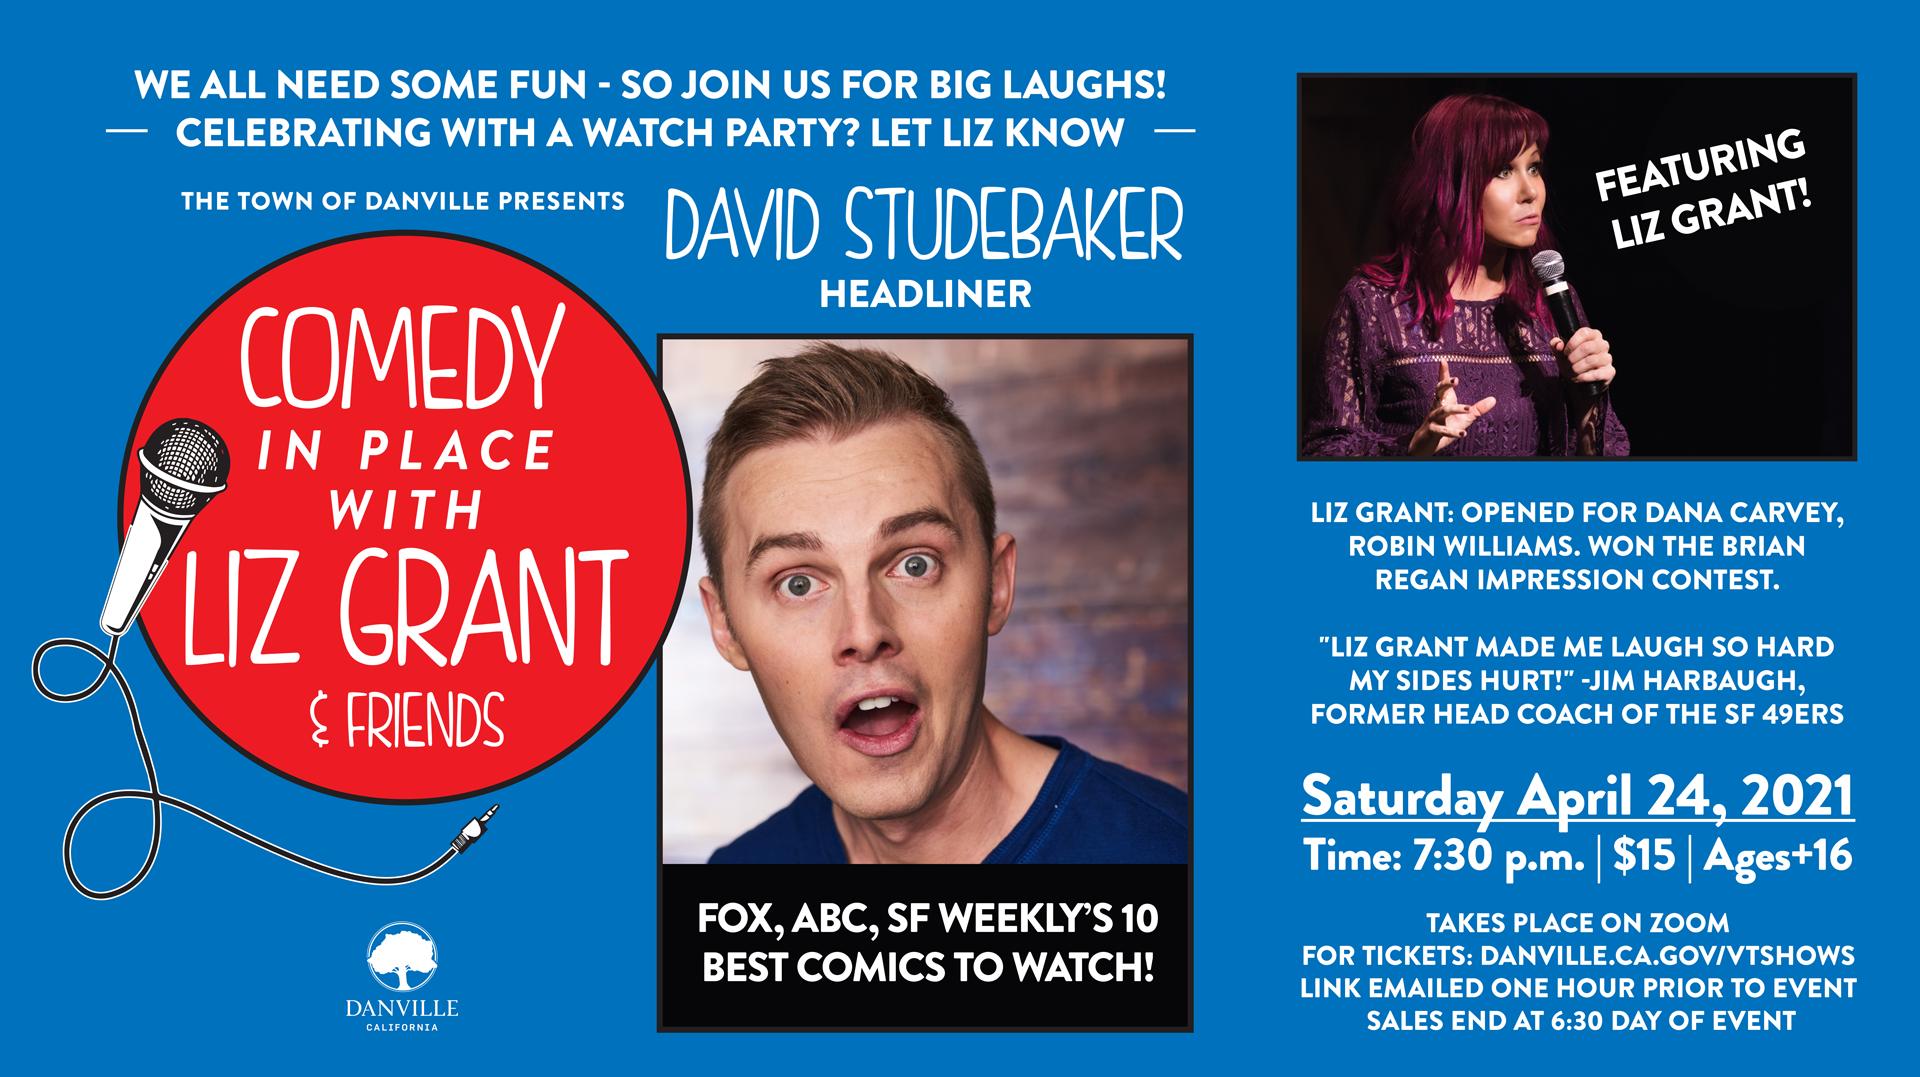 Comedy With Liz Grant & Friends, With Headliner David Studebaker -- Online